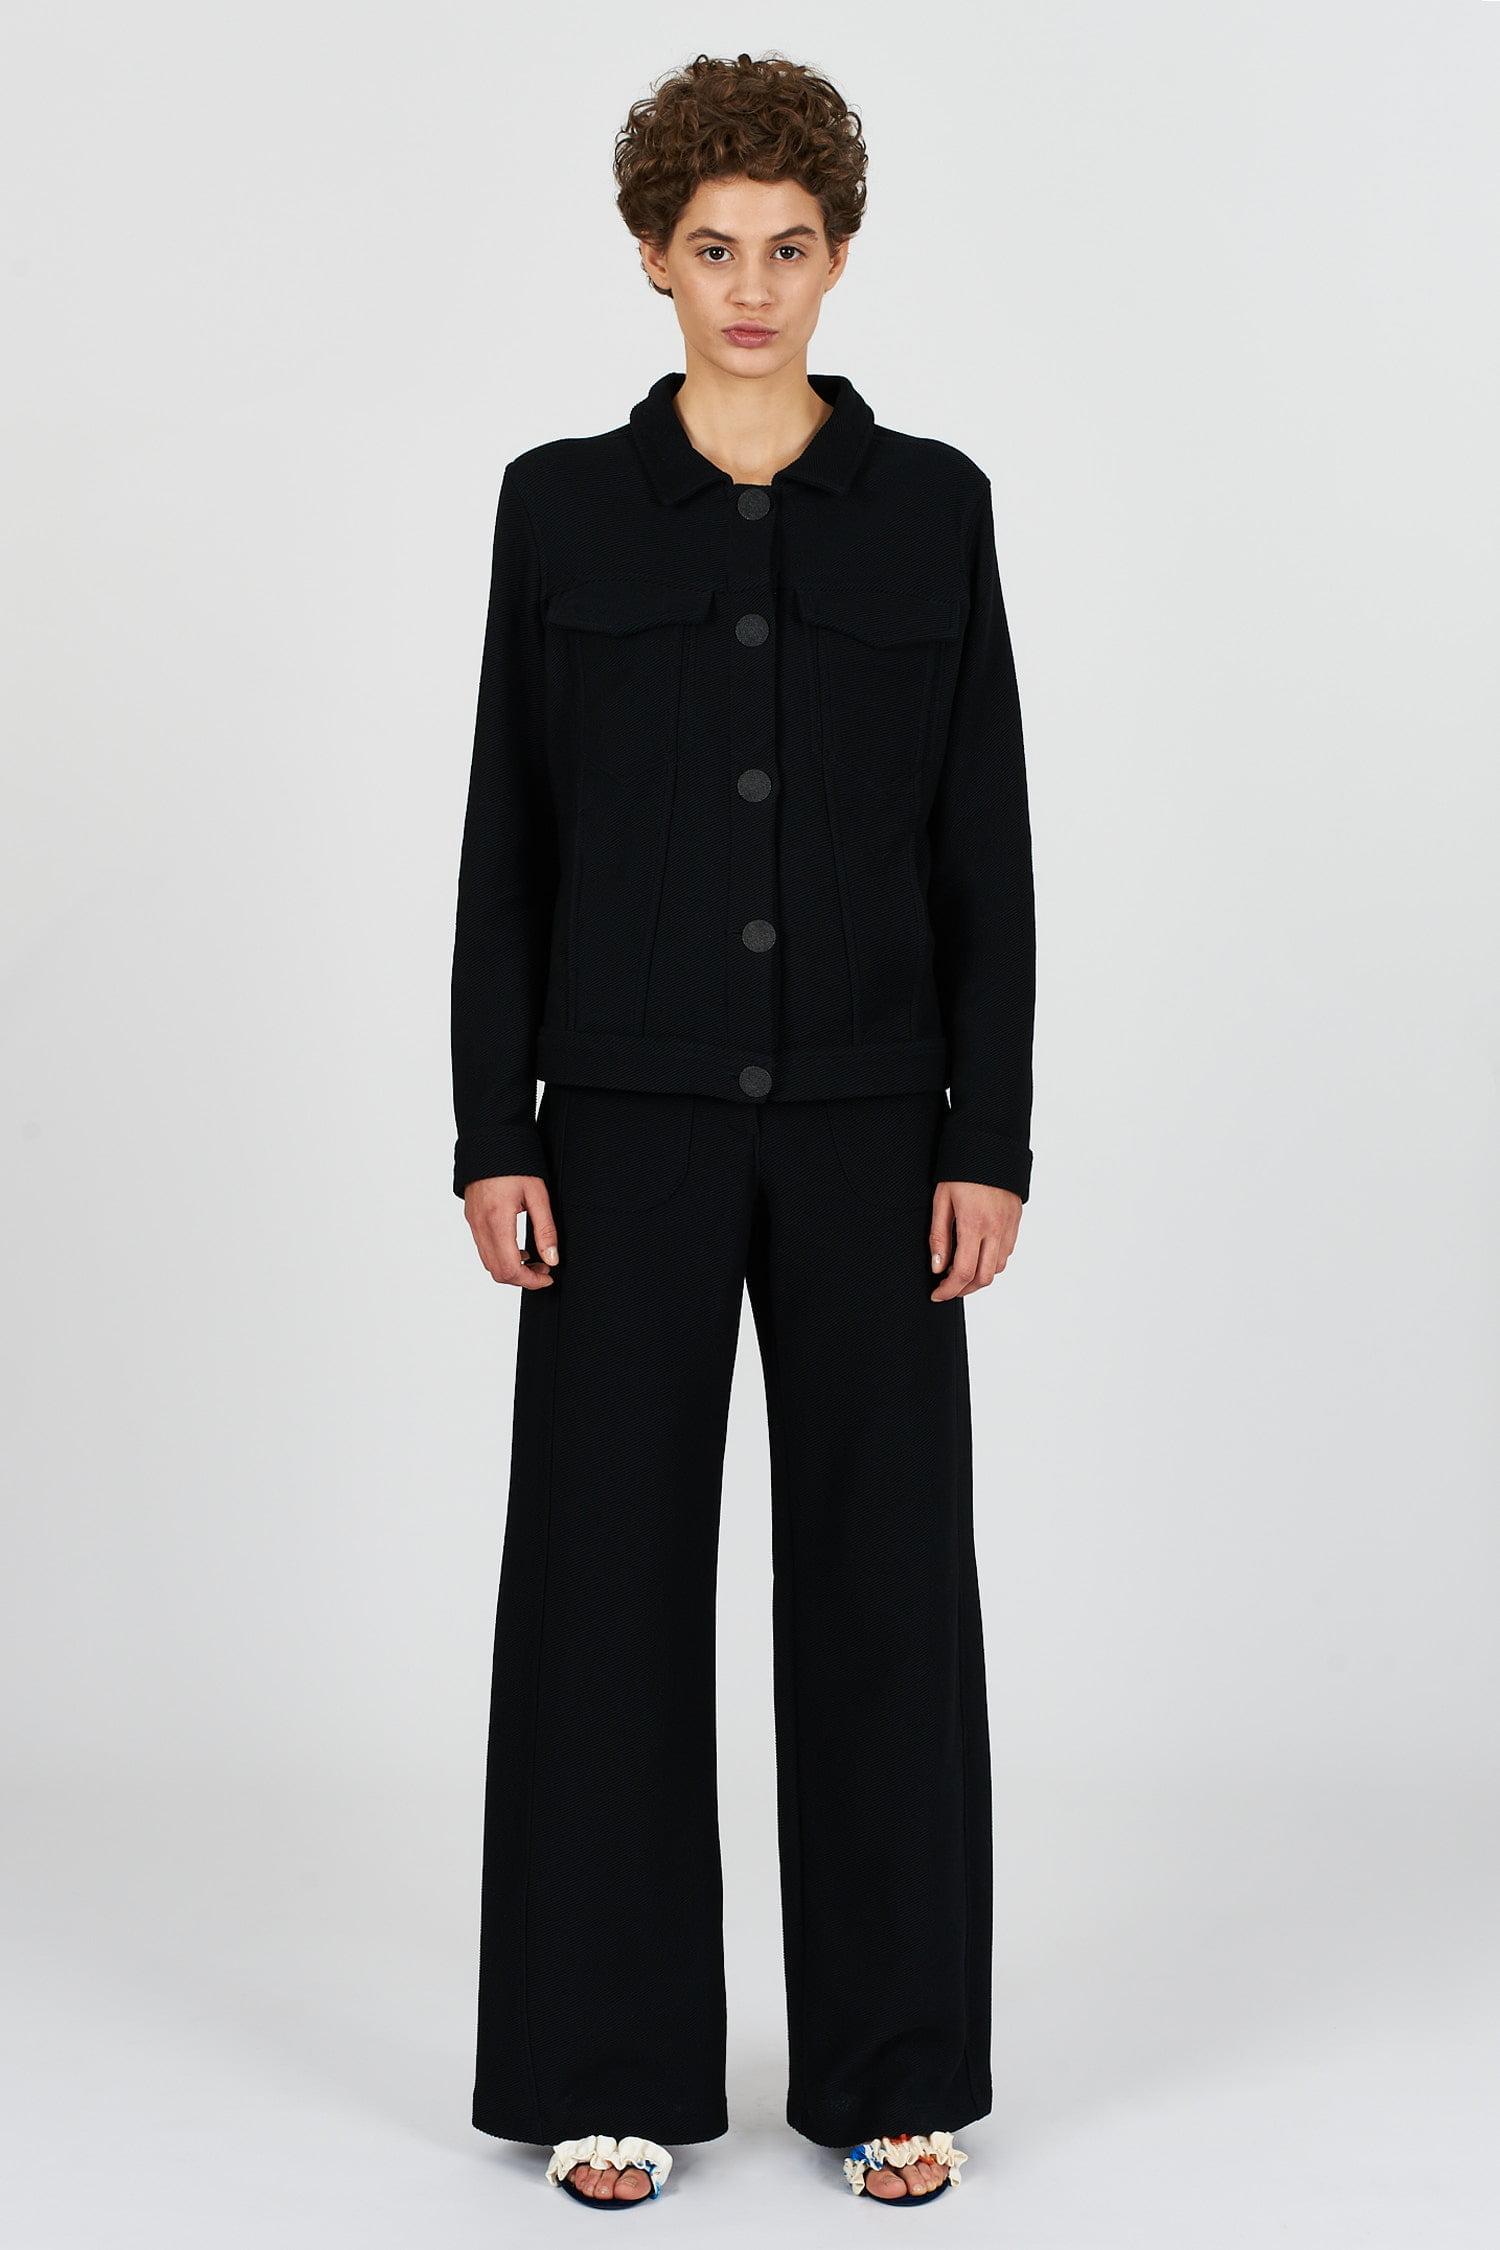 Acephala Fw2021 22 Jean Style Jacket 03